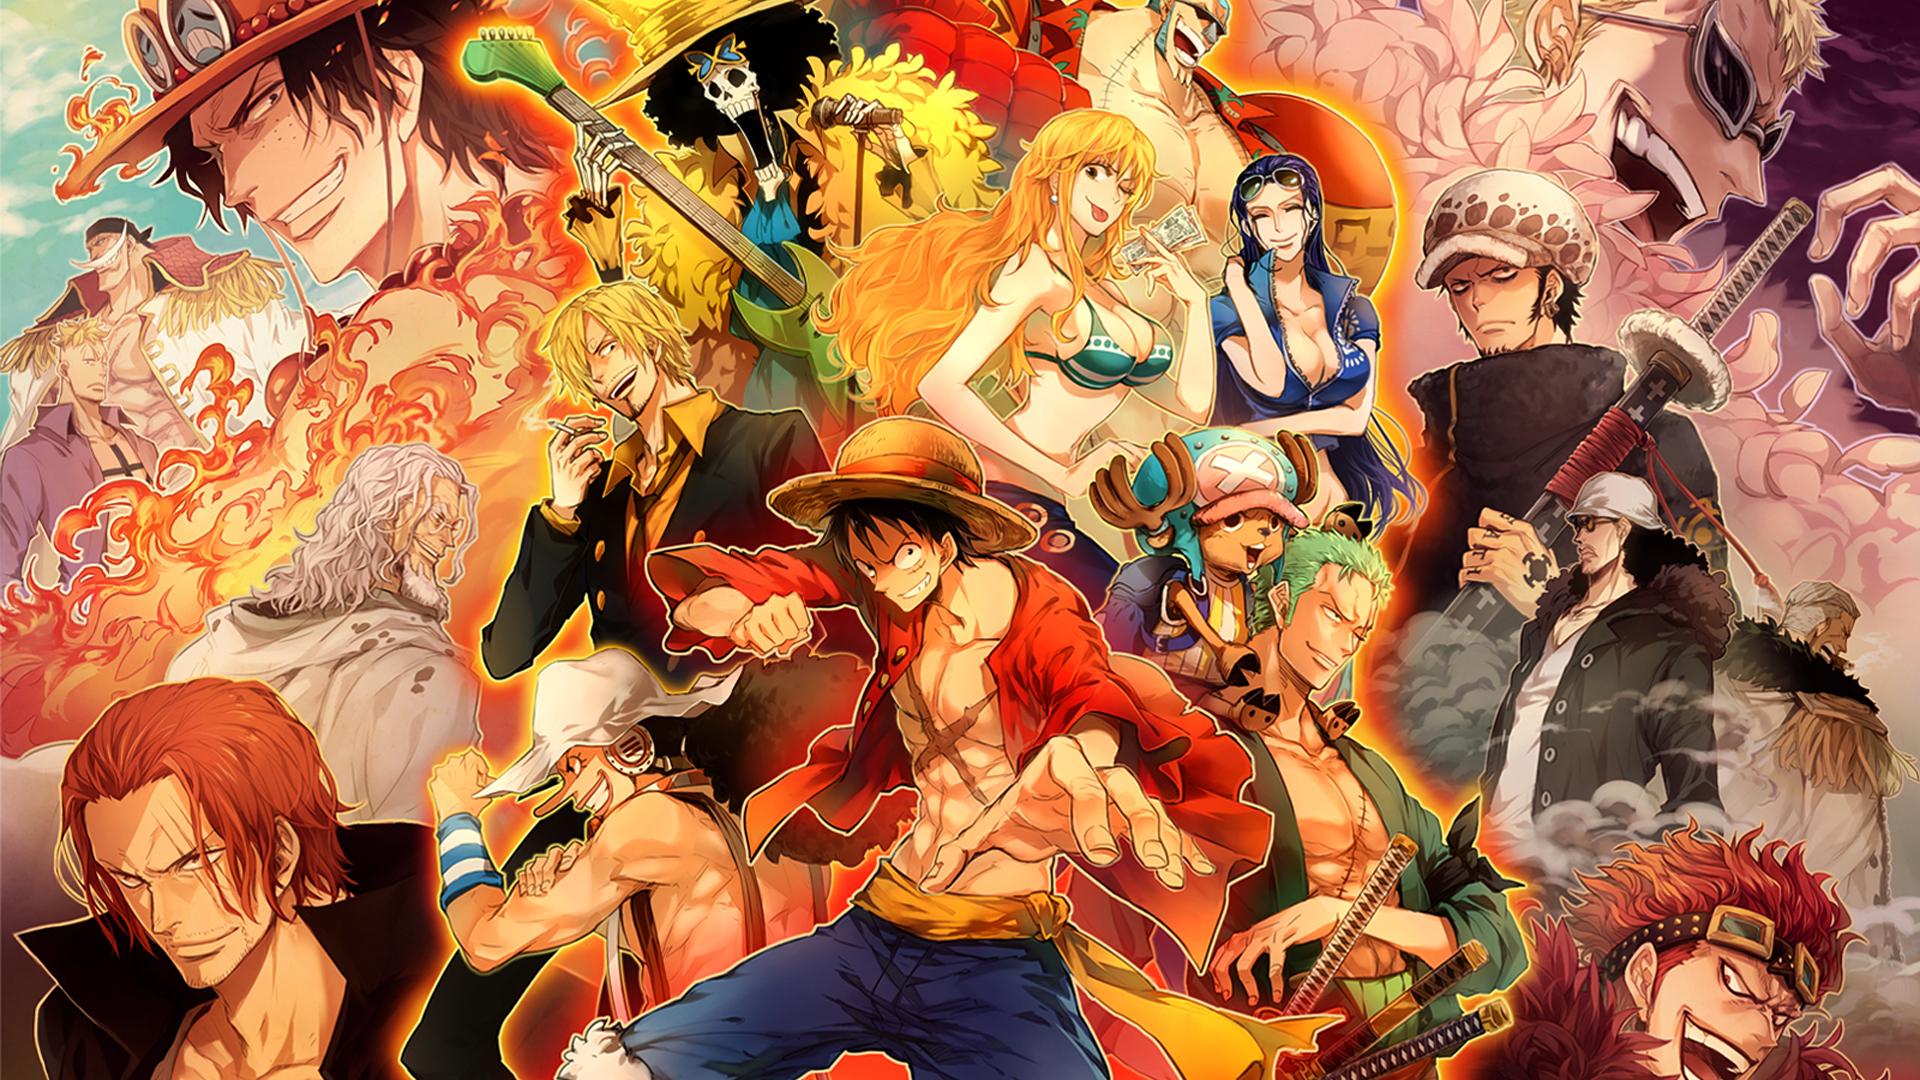 One Piece Anime 01 Wallpaper HD 1920x1080